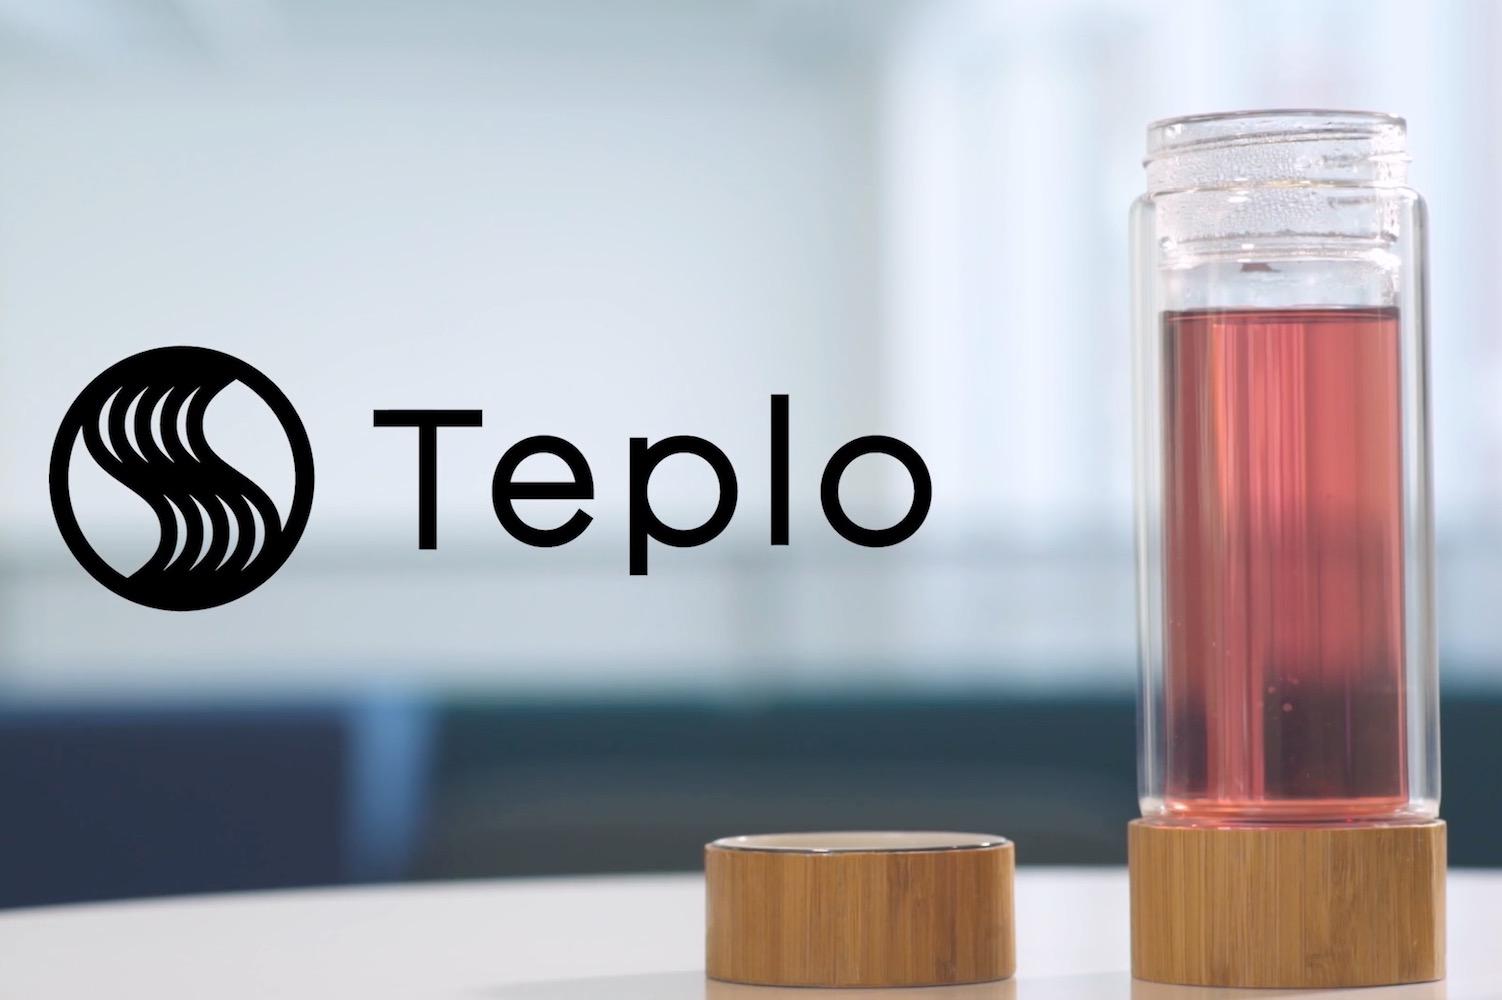 Teplo Bottle